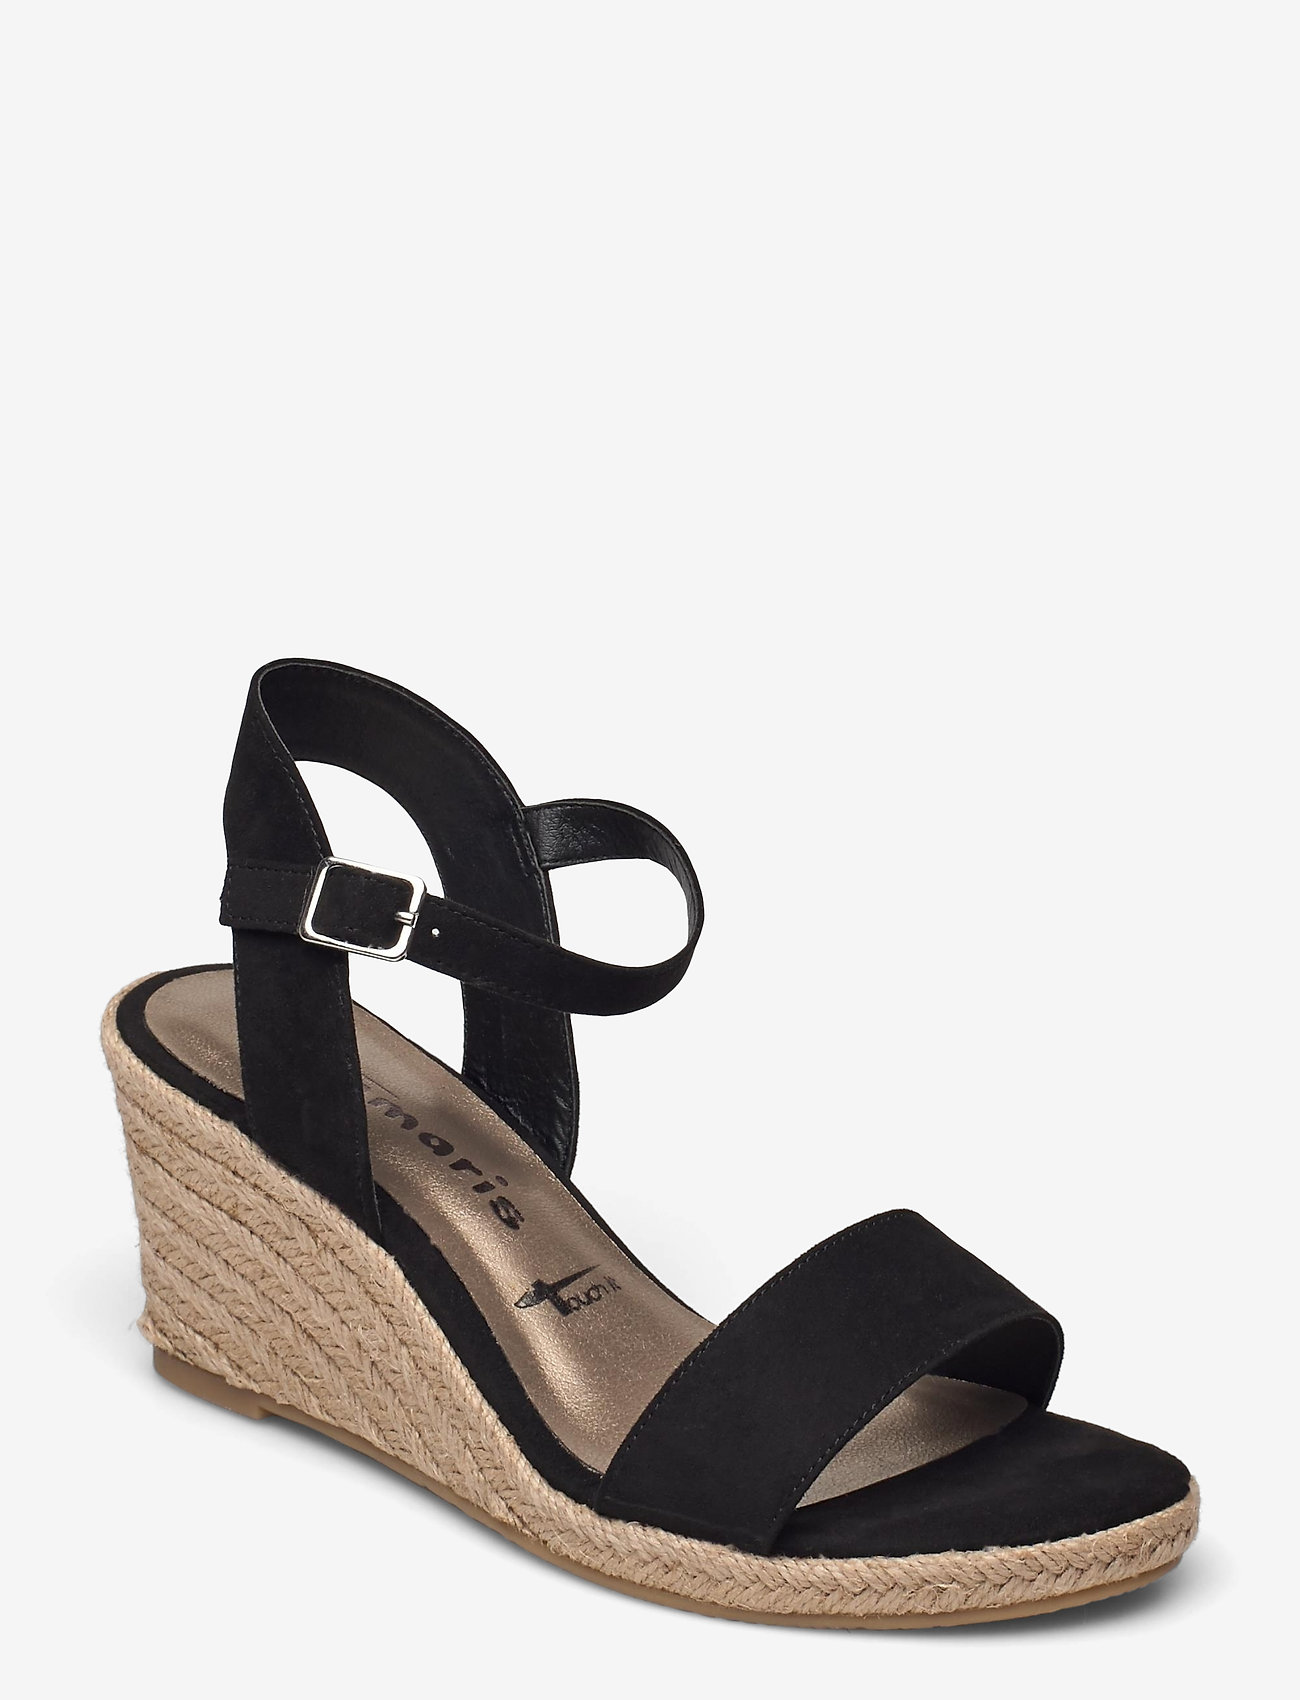 Tamaris - Woms Sandals - espadrilles mit absatz - black - 0